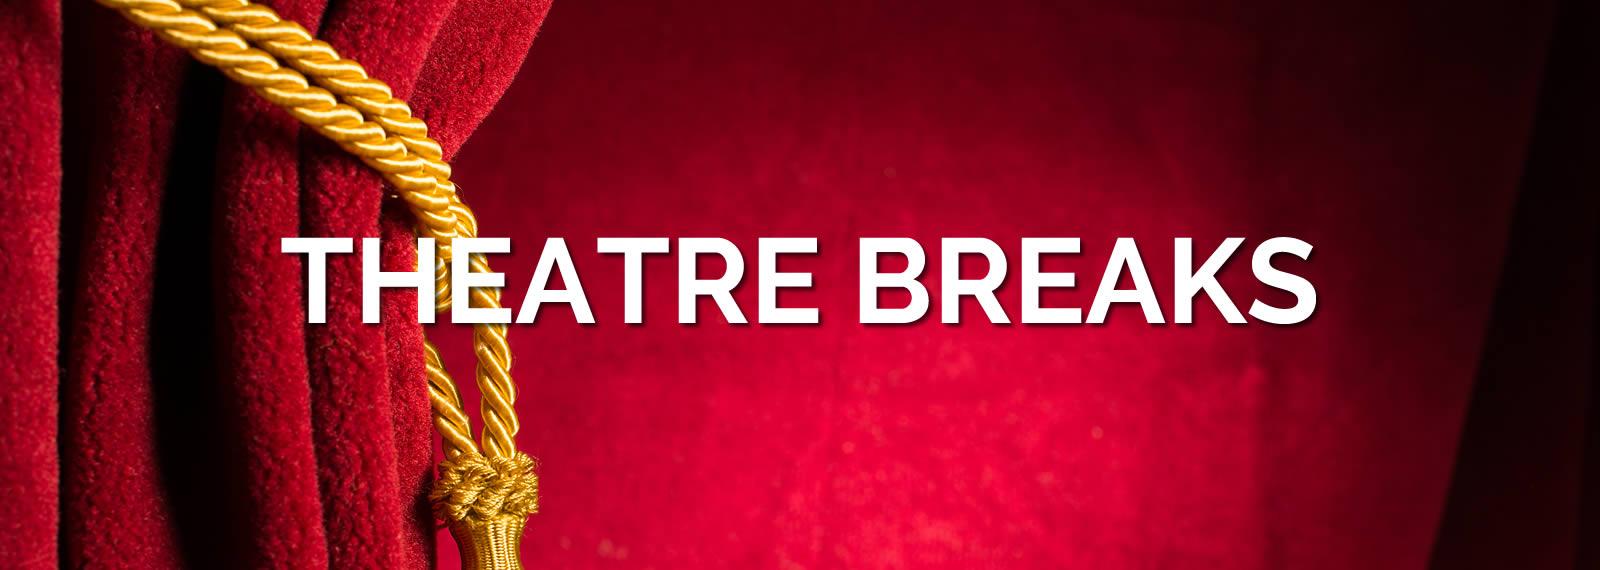 Theatre Breaks